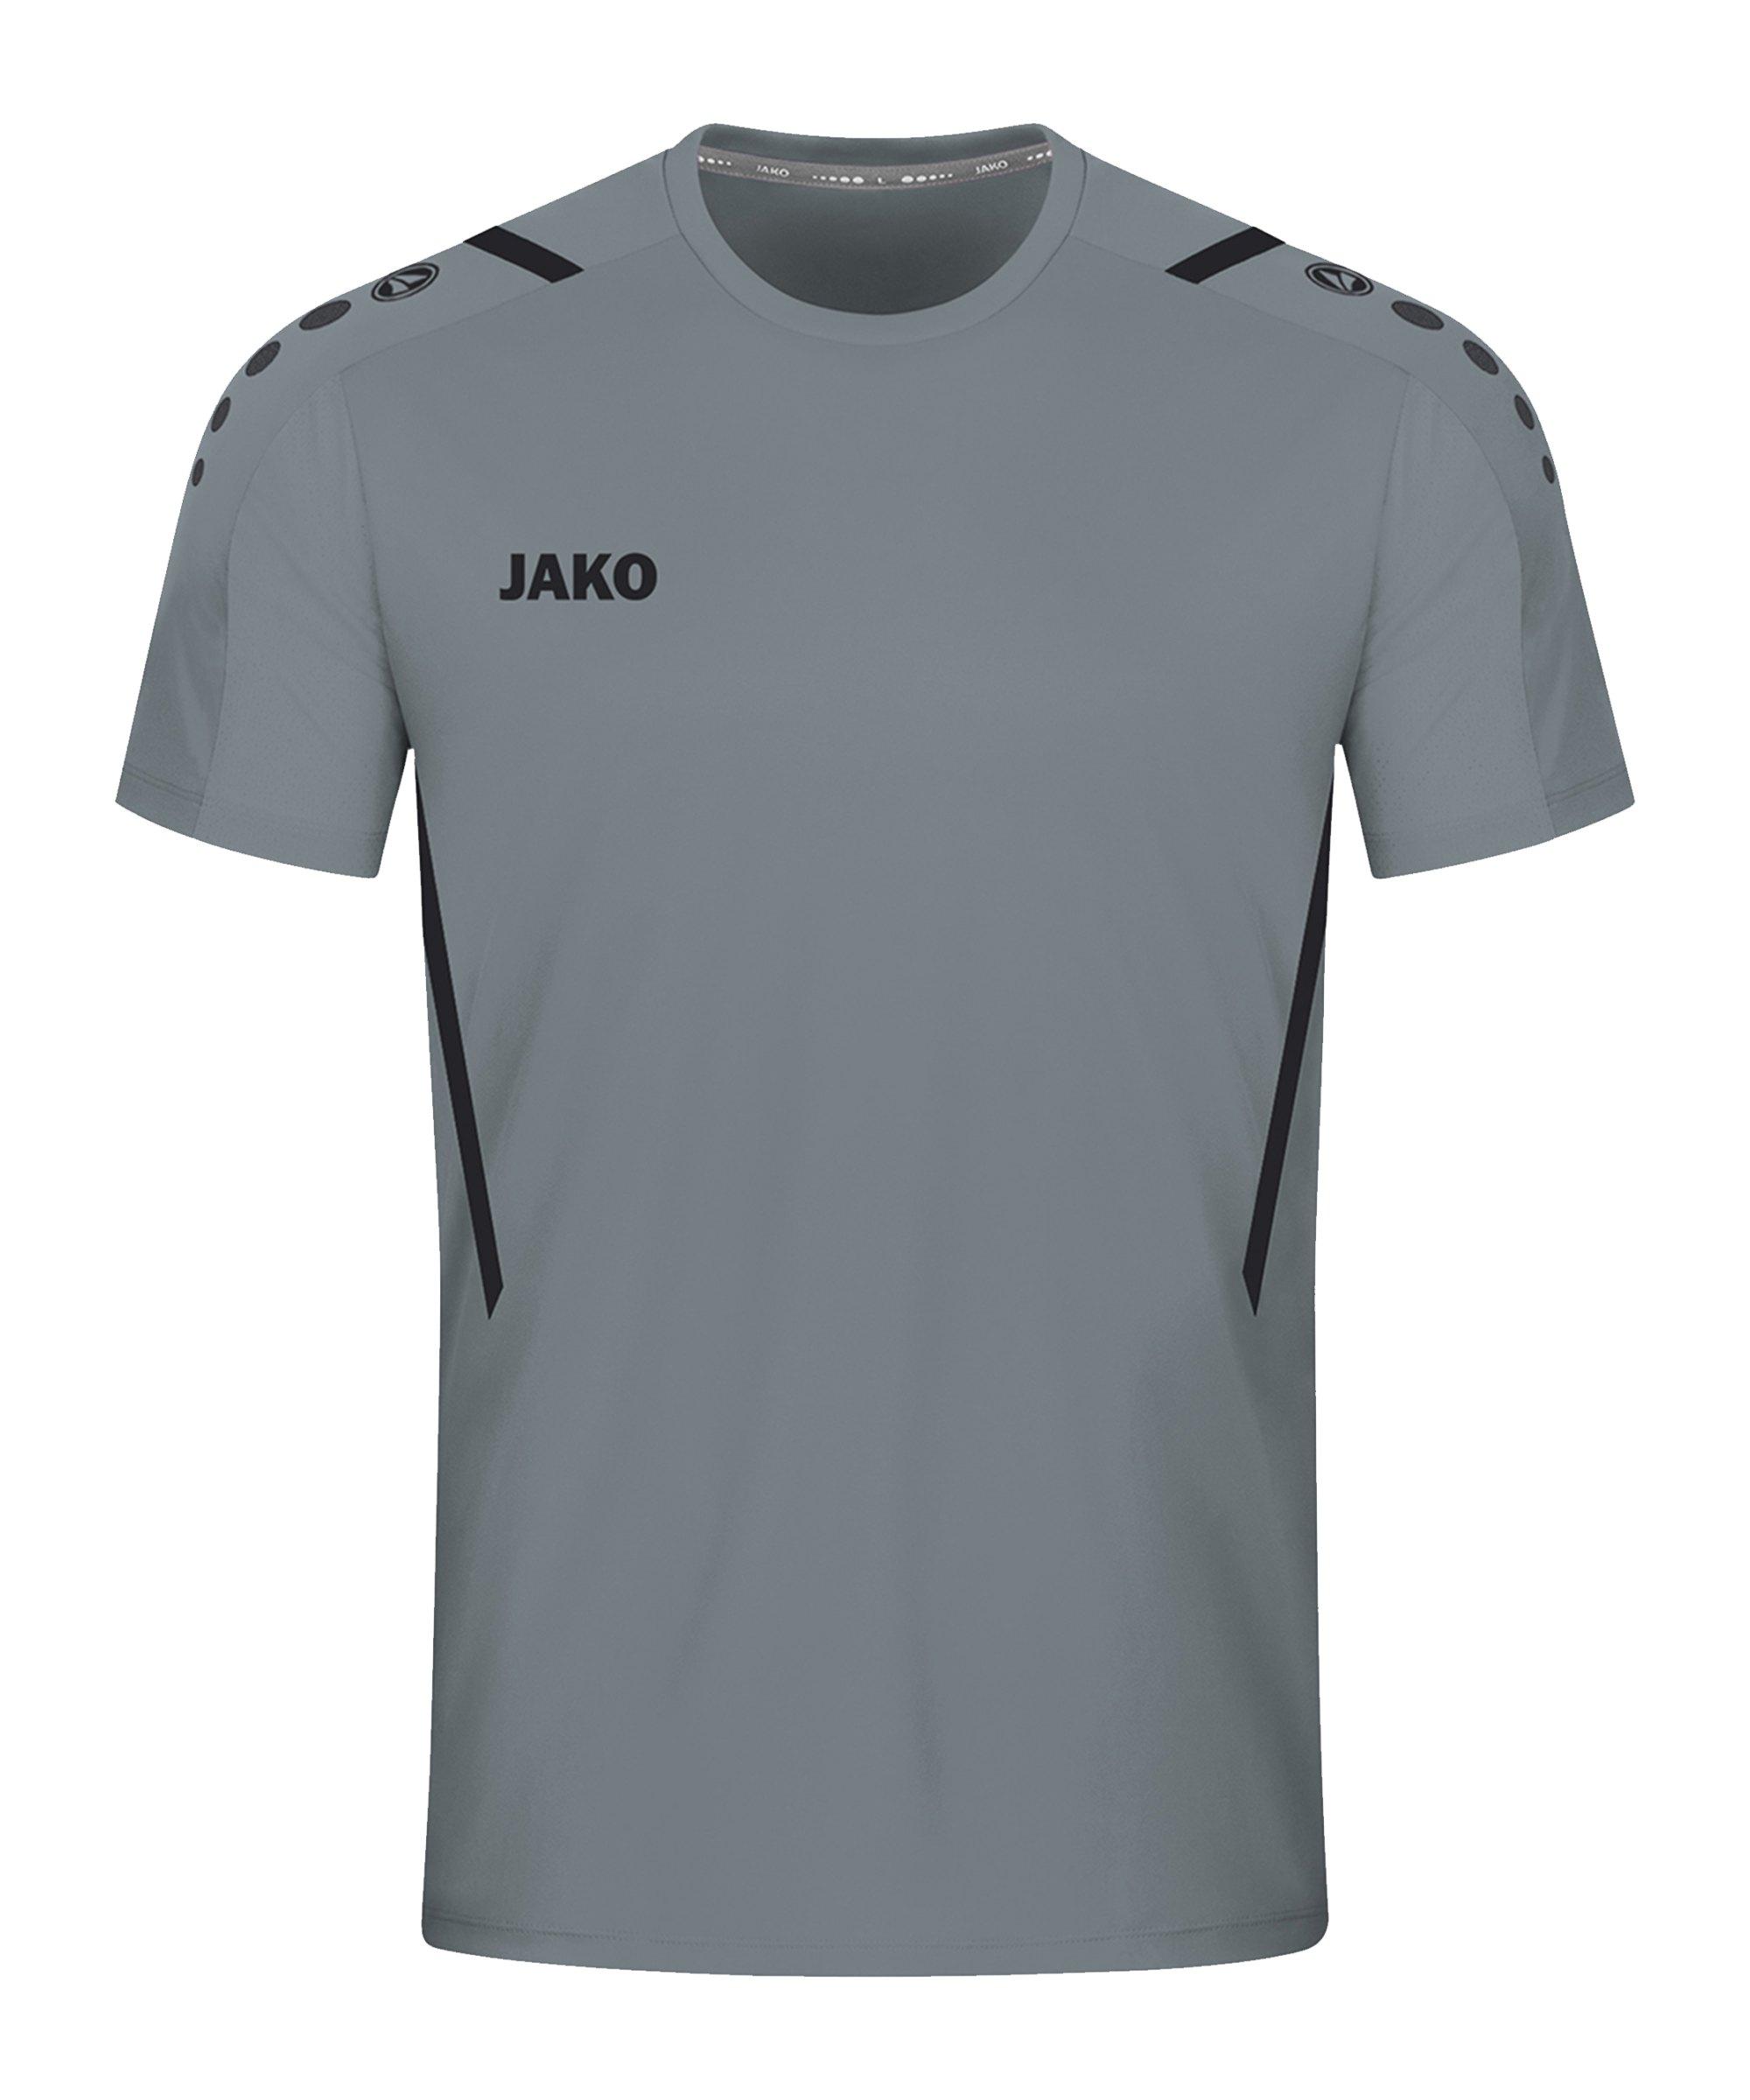 JAKO Challenge Trikot Kids Grau Schwarz F841 - grau